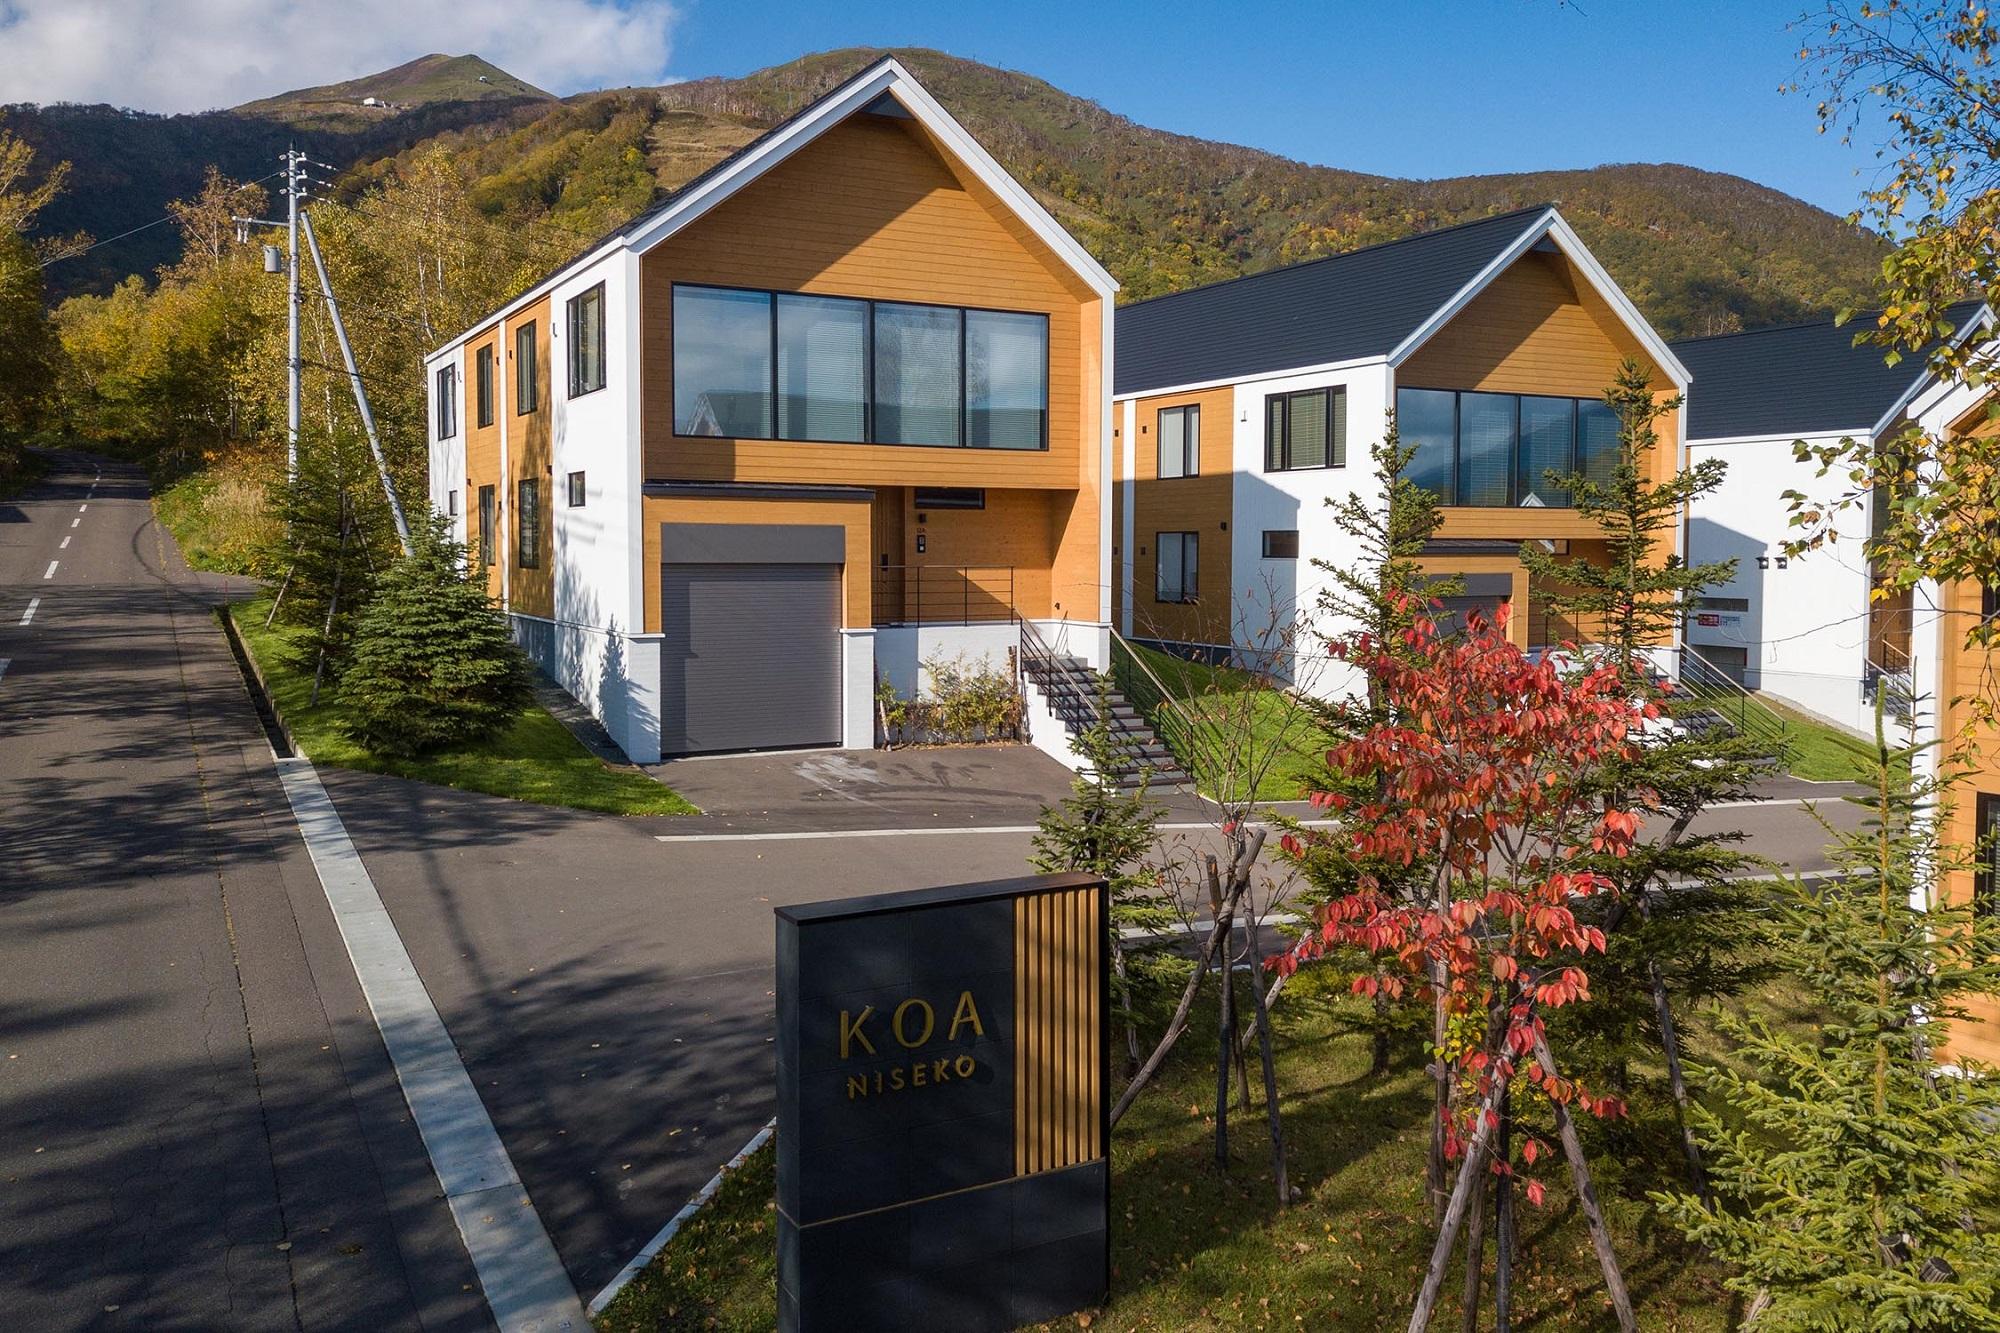 H2 Life Resorts ラグジュアリー・ニセコ東山